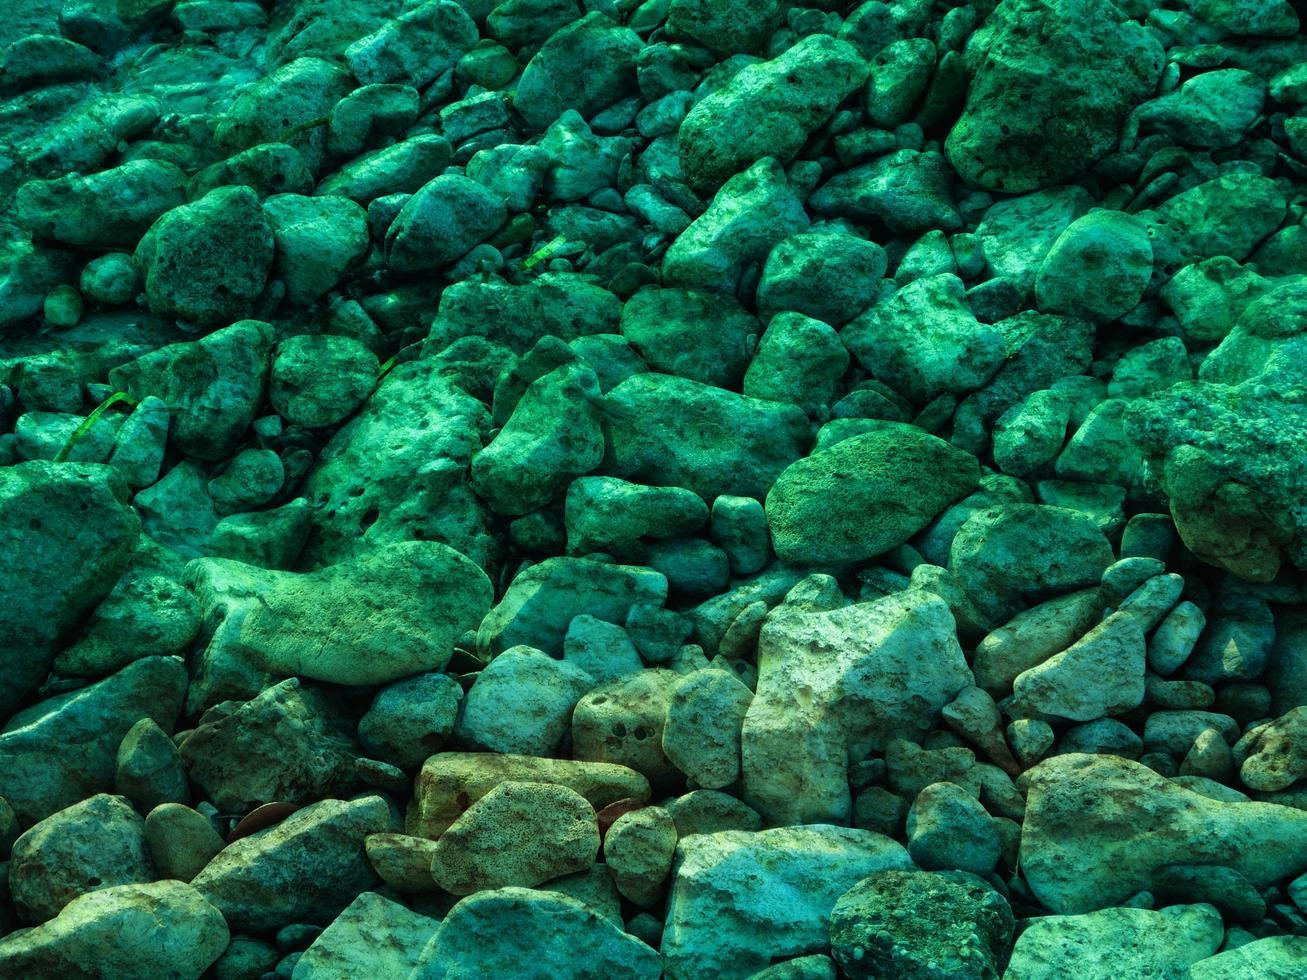 textura de piedra verde azulado foto